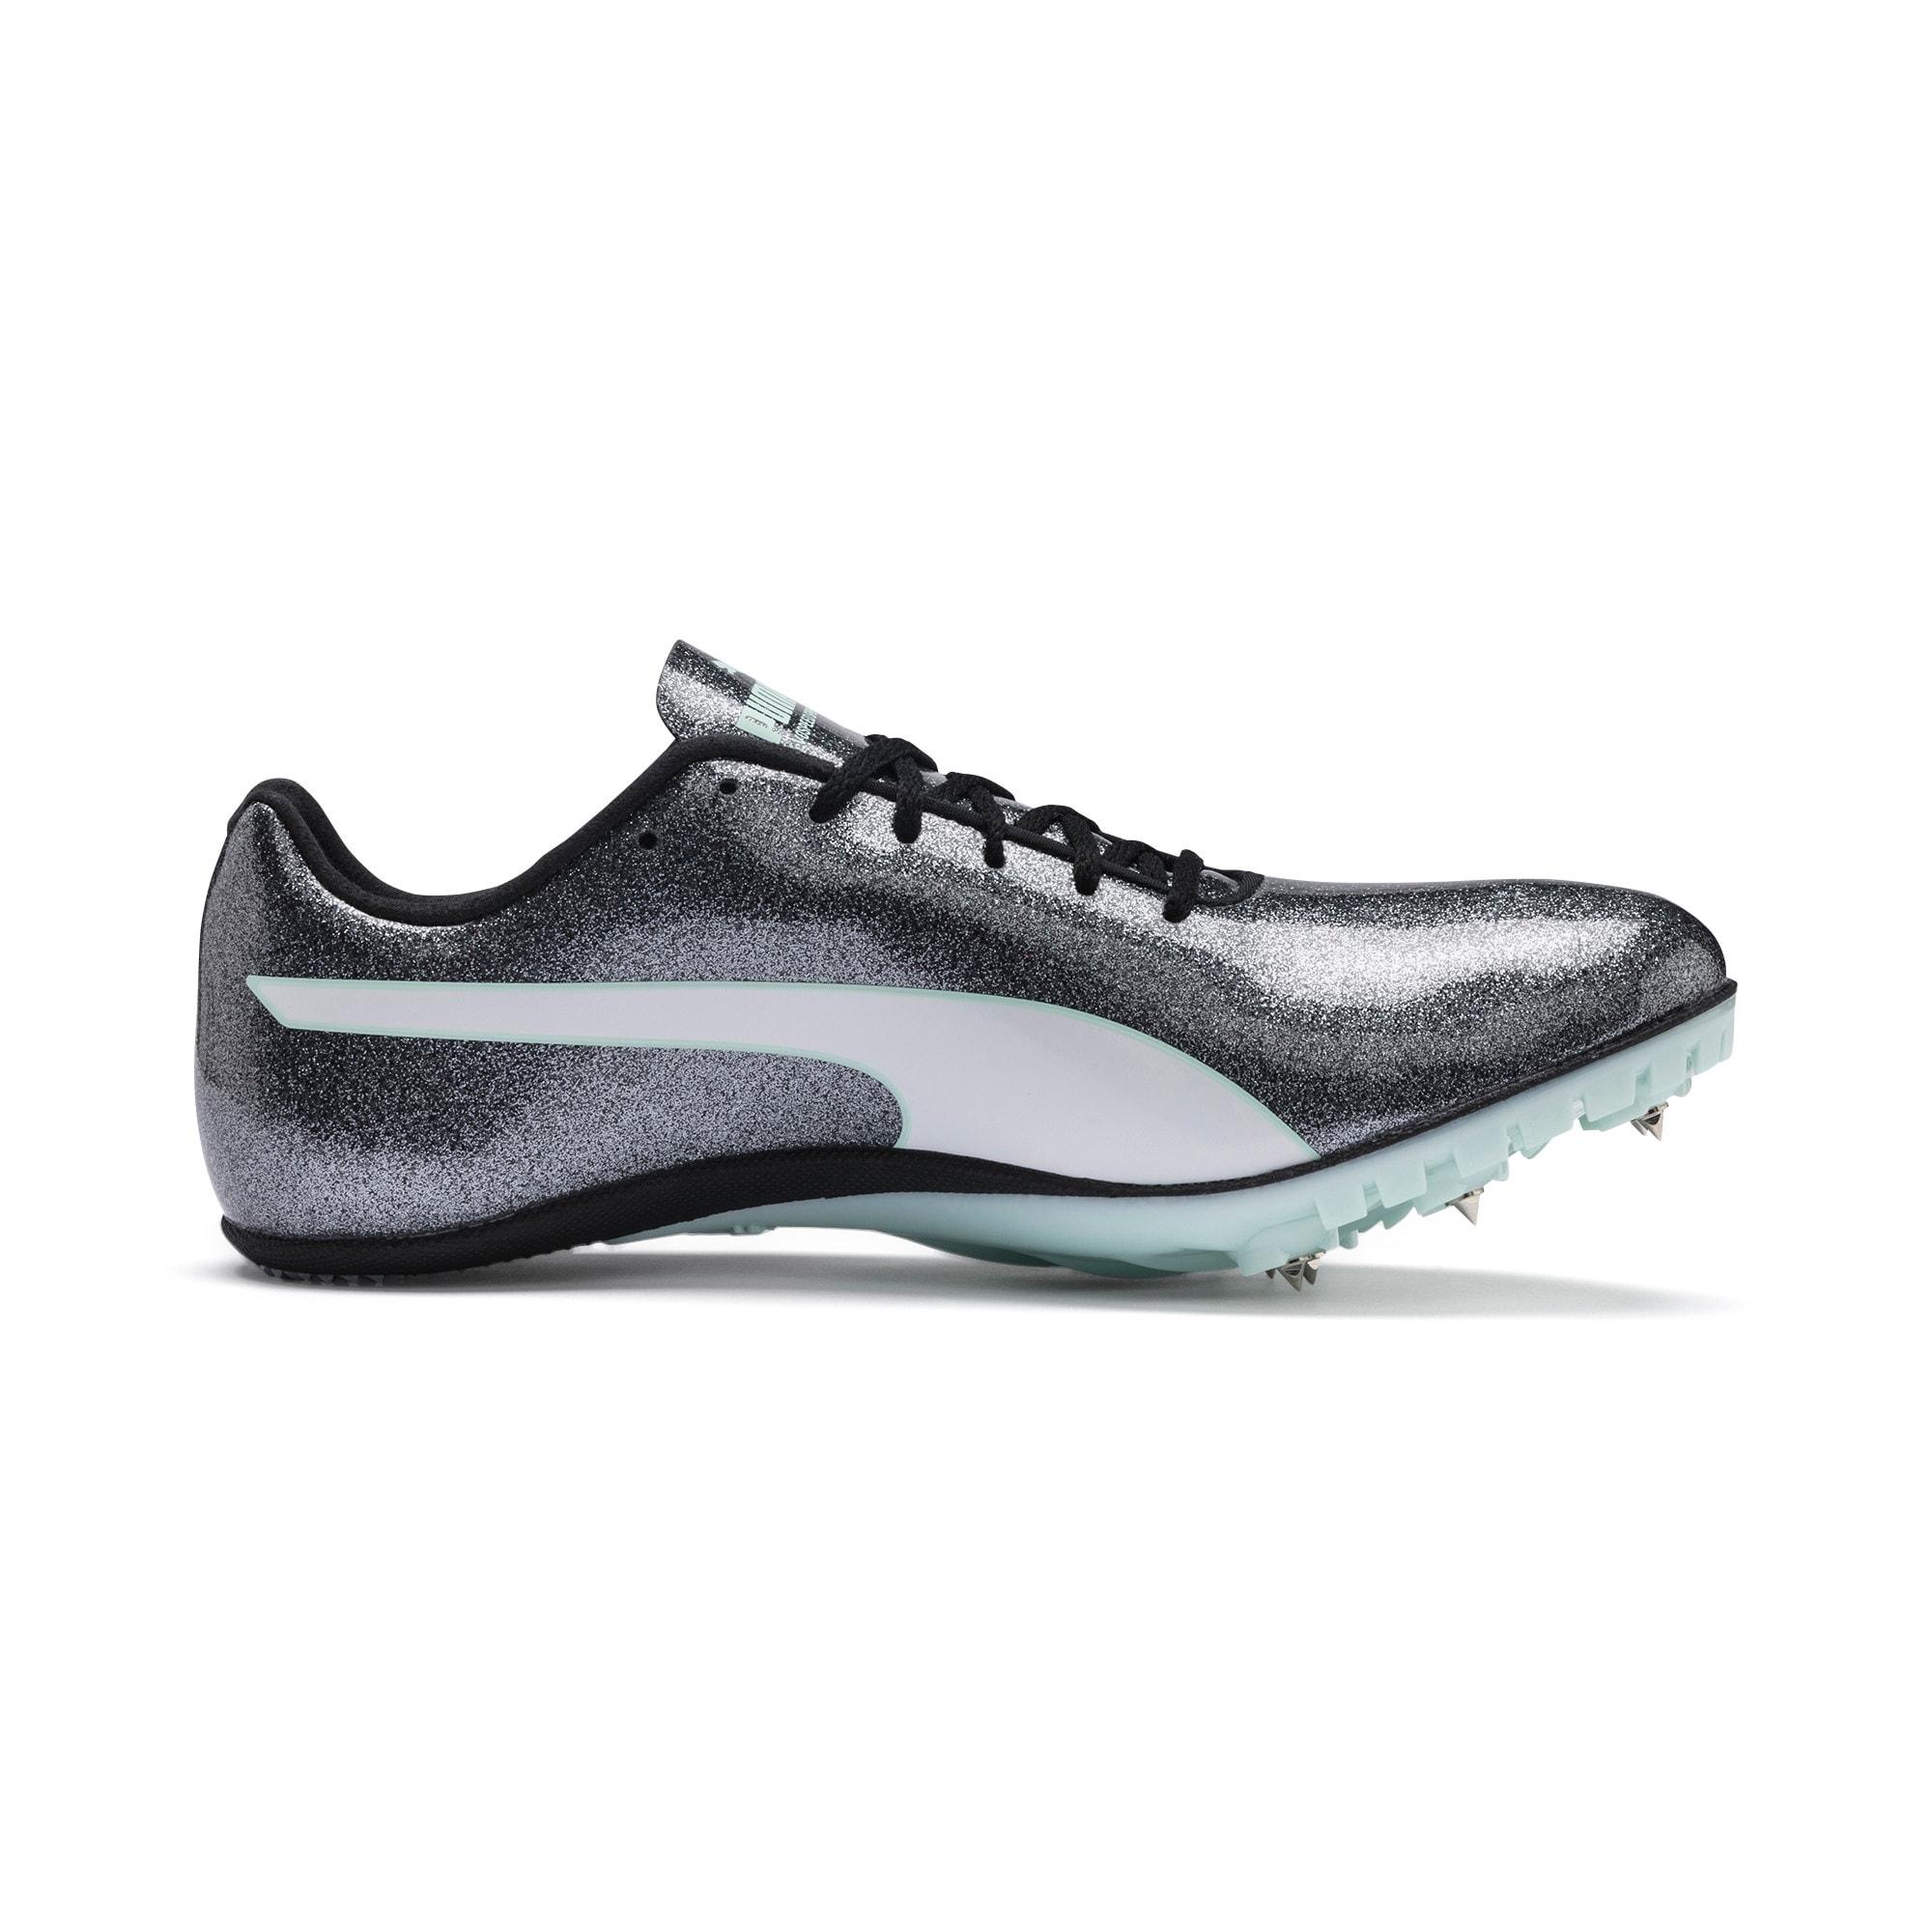 Thumbnail 5 of evoSPEED Sprint 9 hardloopschoenen voor dames, Steel Gray-Fair Aqua-White, medium